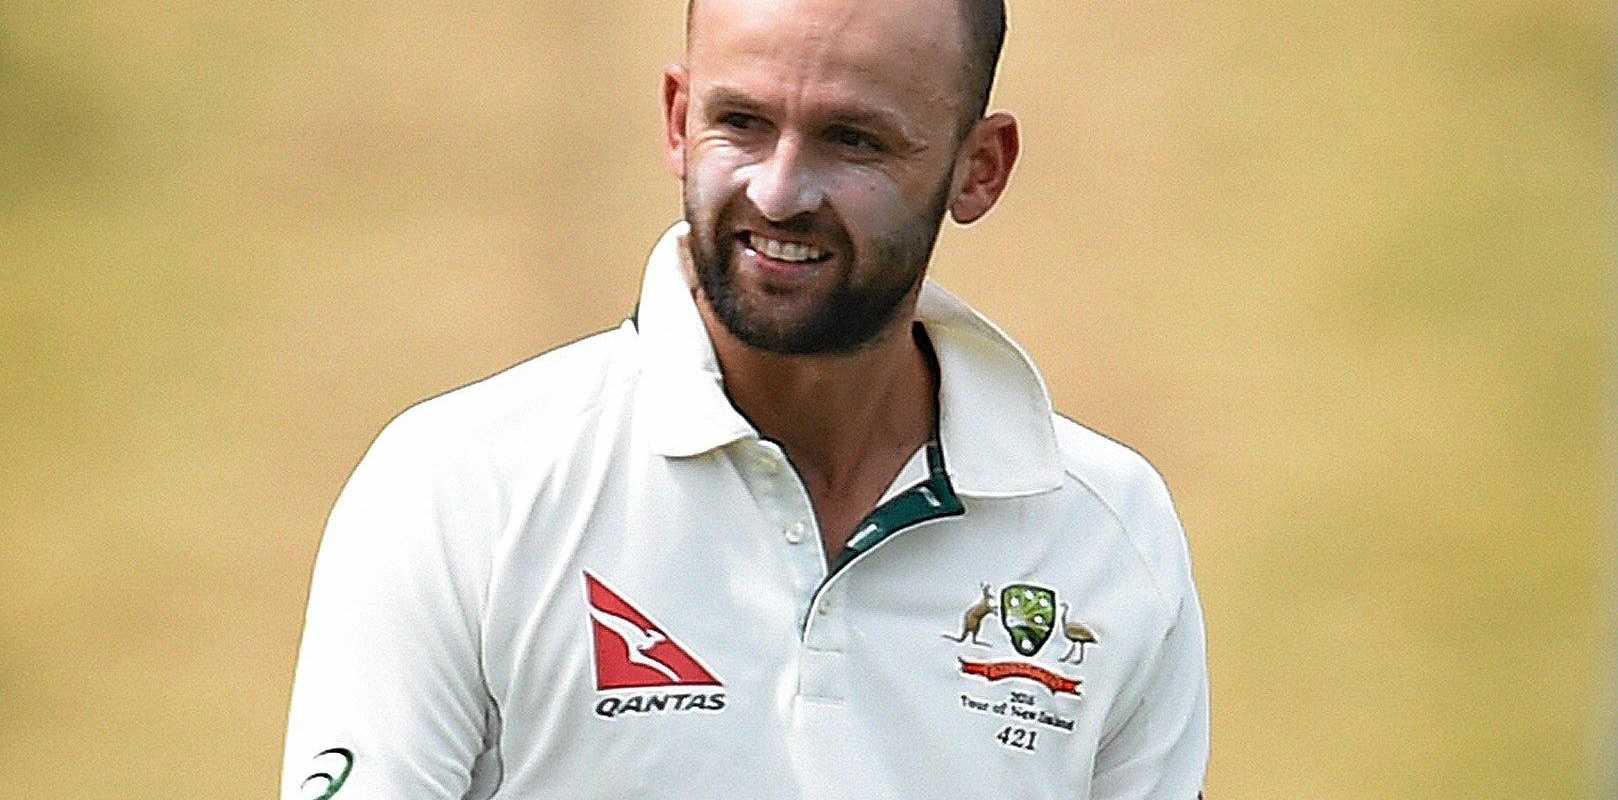 BARREN SPELL: Australian bowler Nathan Lyon took just two wickets in two innings against a Sri Lankan Board XI.